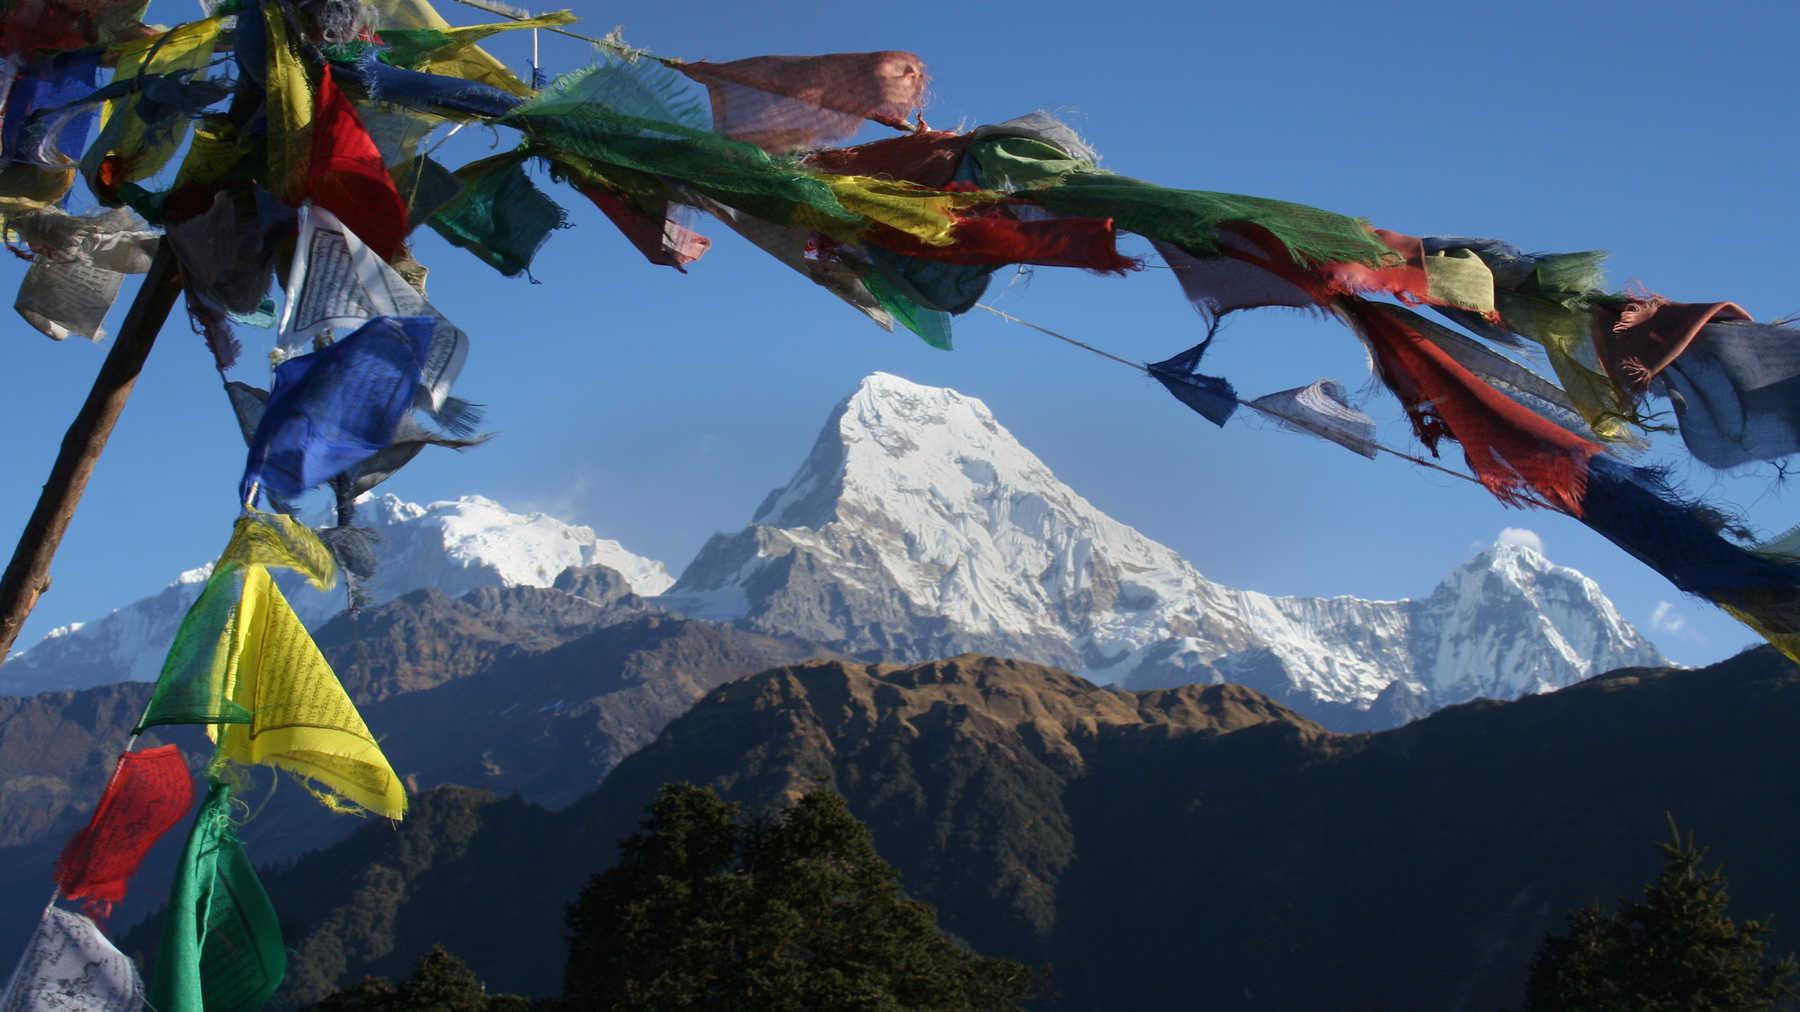 Annapurna Sanctuary Annapurna, Nepal